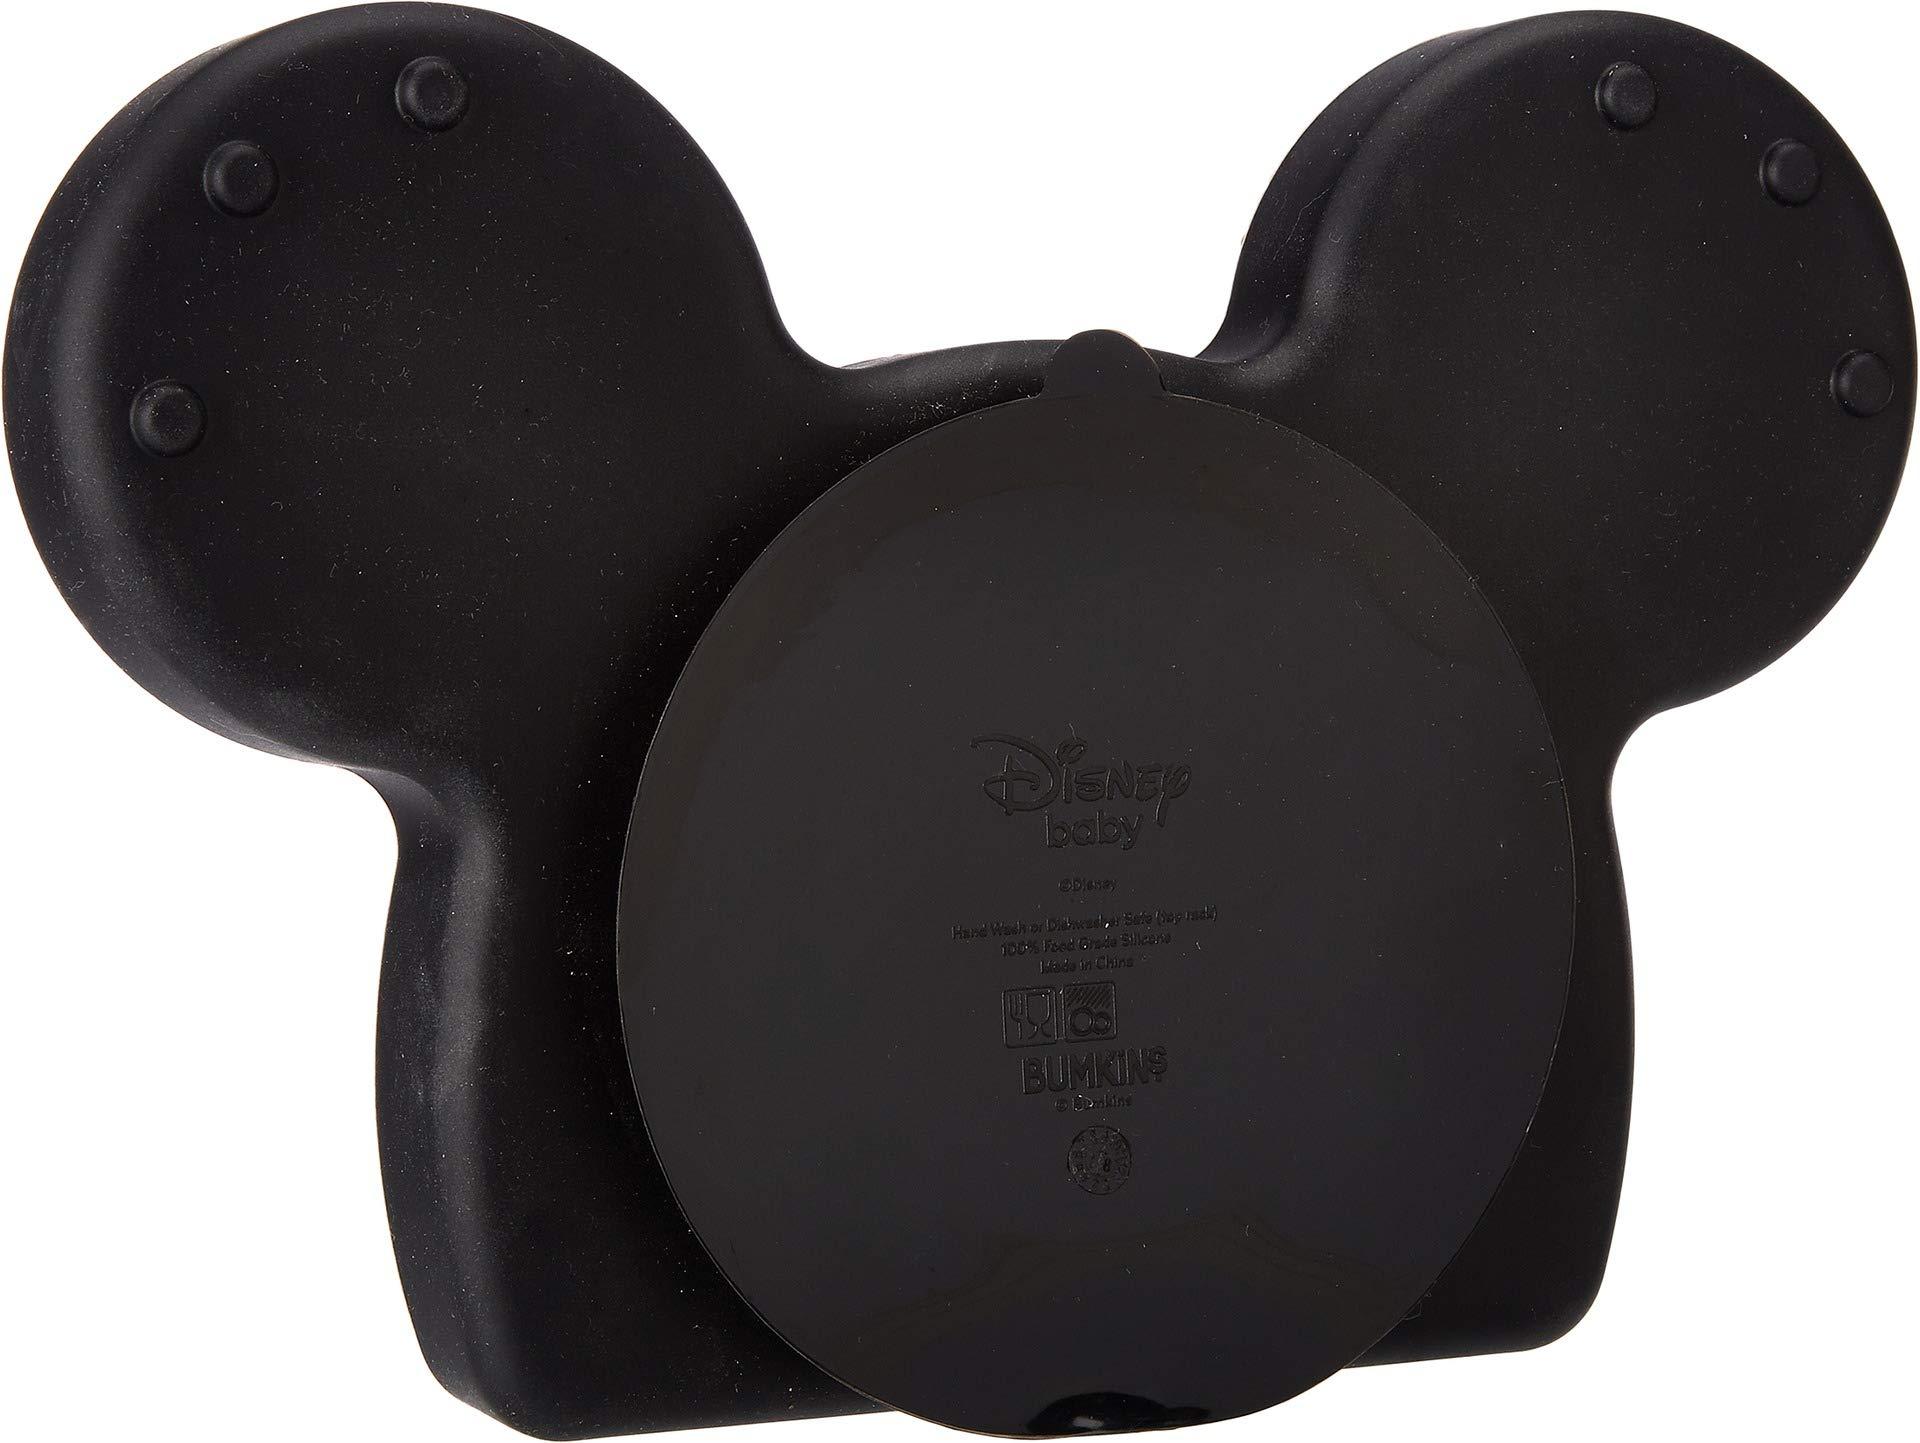 Bumkins Unisex Disney Mickey Silicone Grip Dish w/Bib 2-Pack Mickey One Size